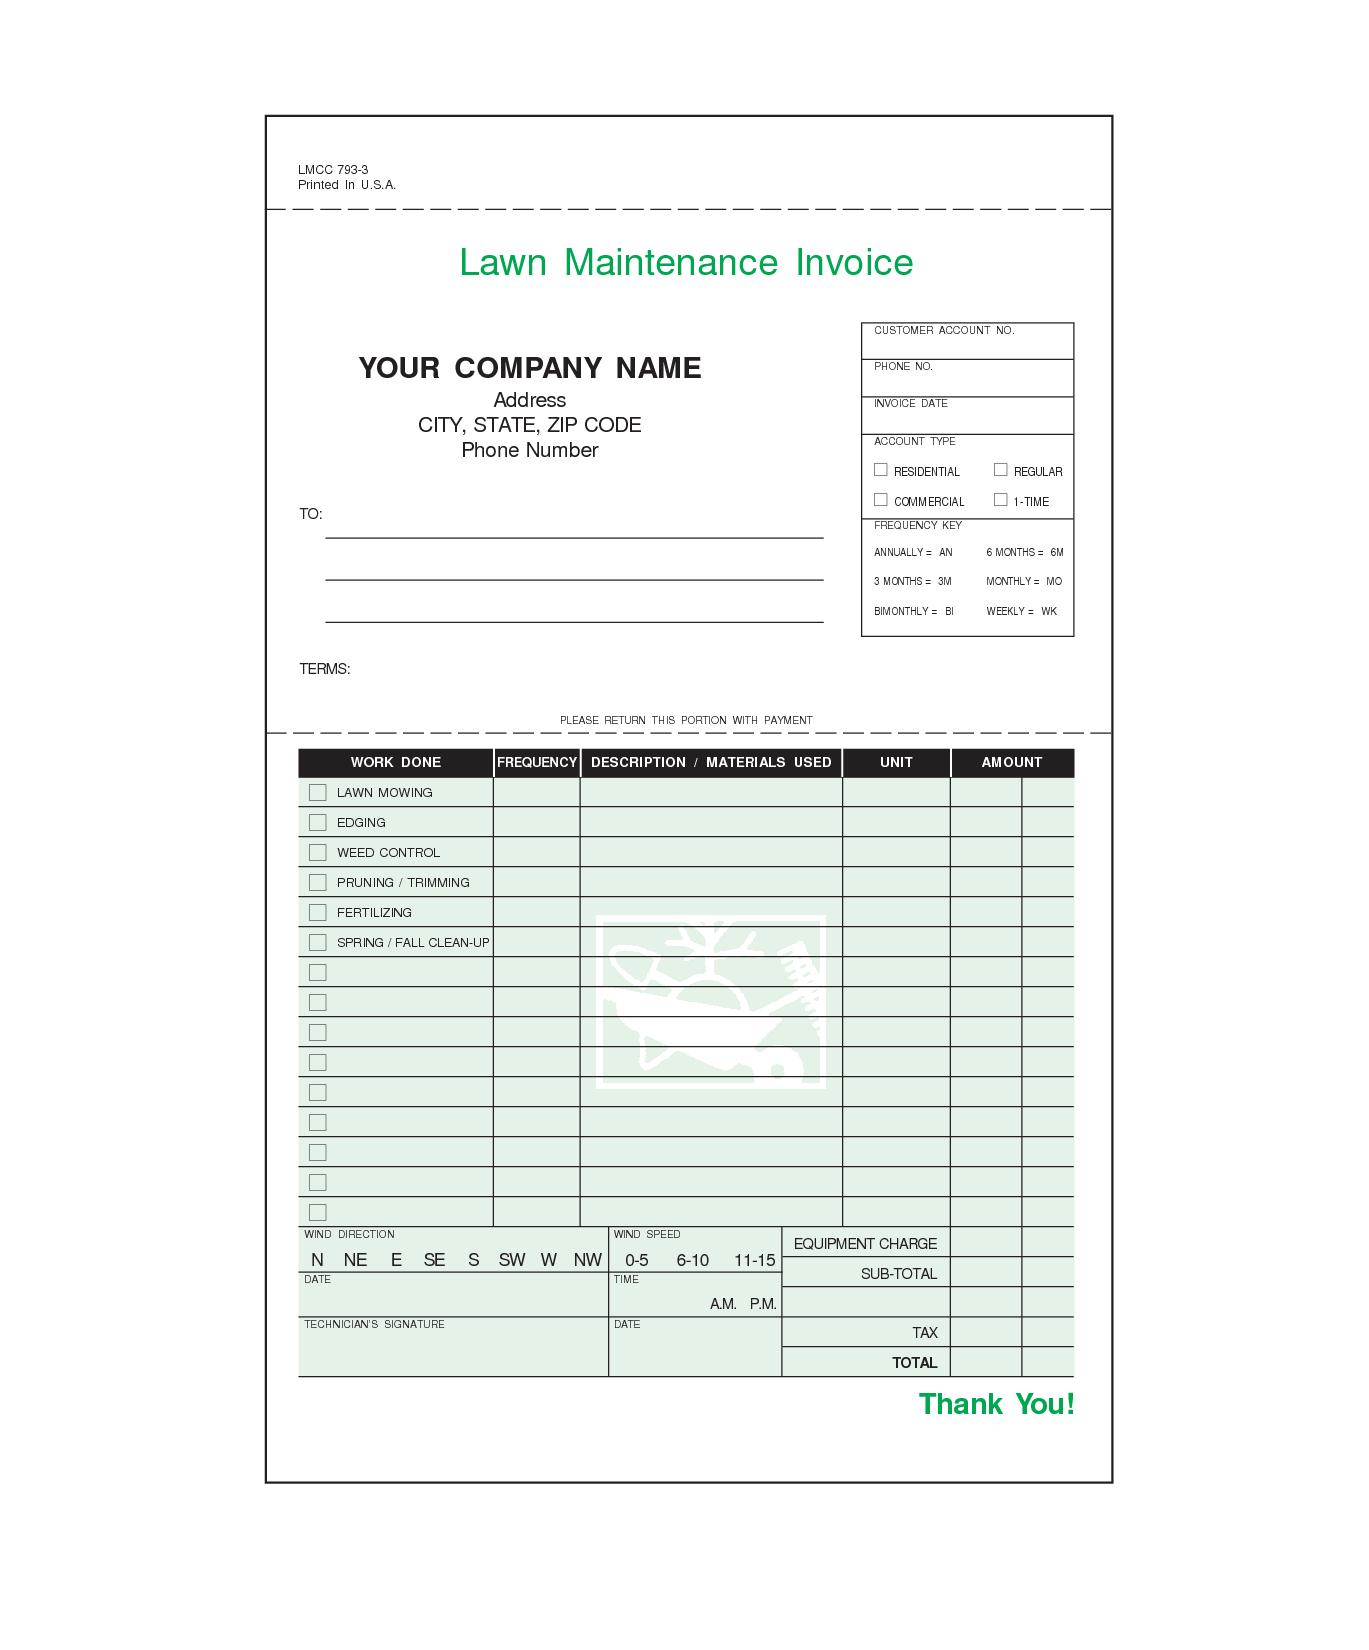 Pingina Taliaferro On Invoices  Invoice Template Invoice Inside Lawn Maintenance Invoice Template